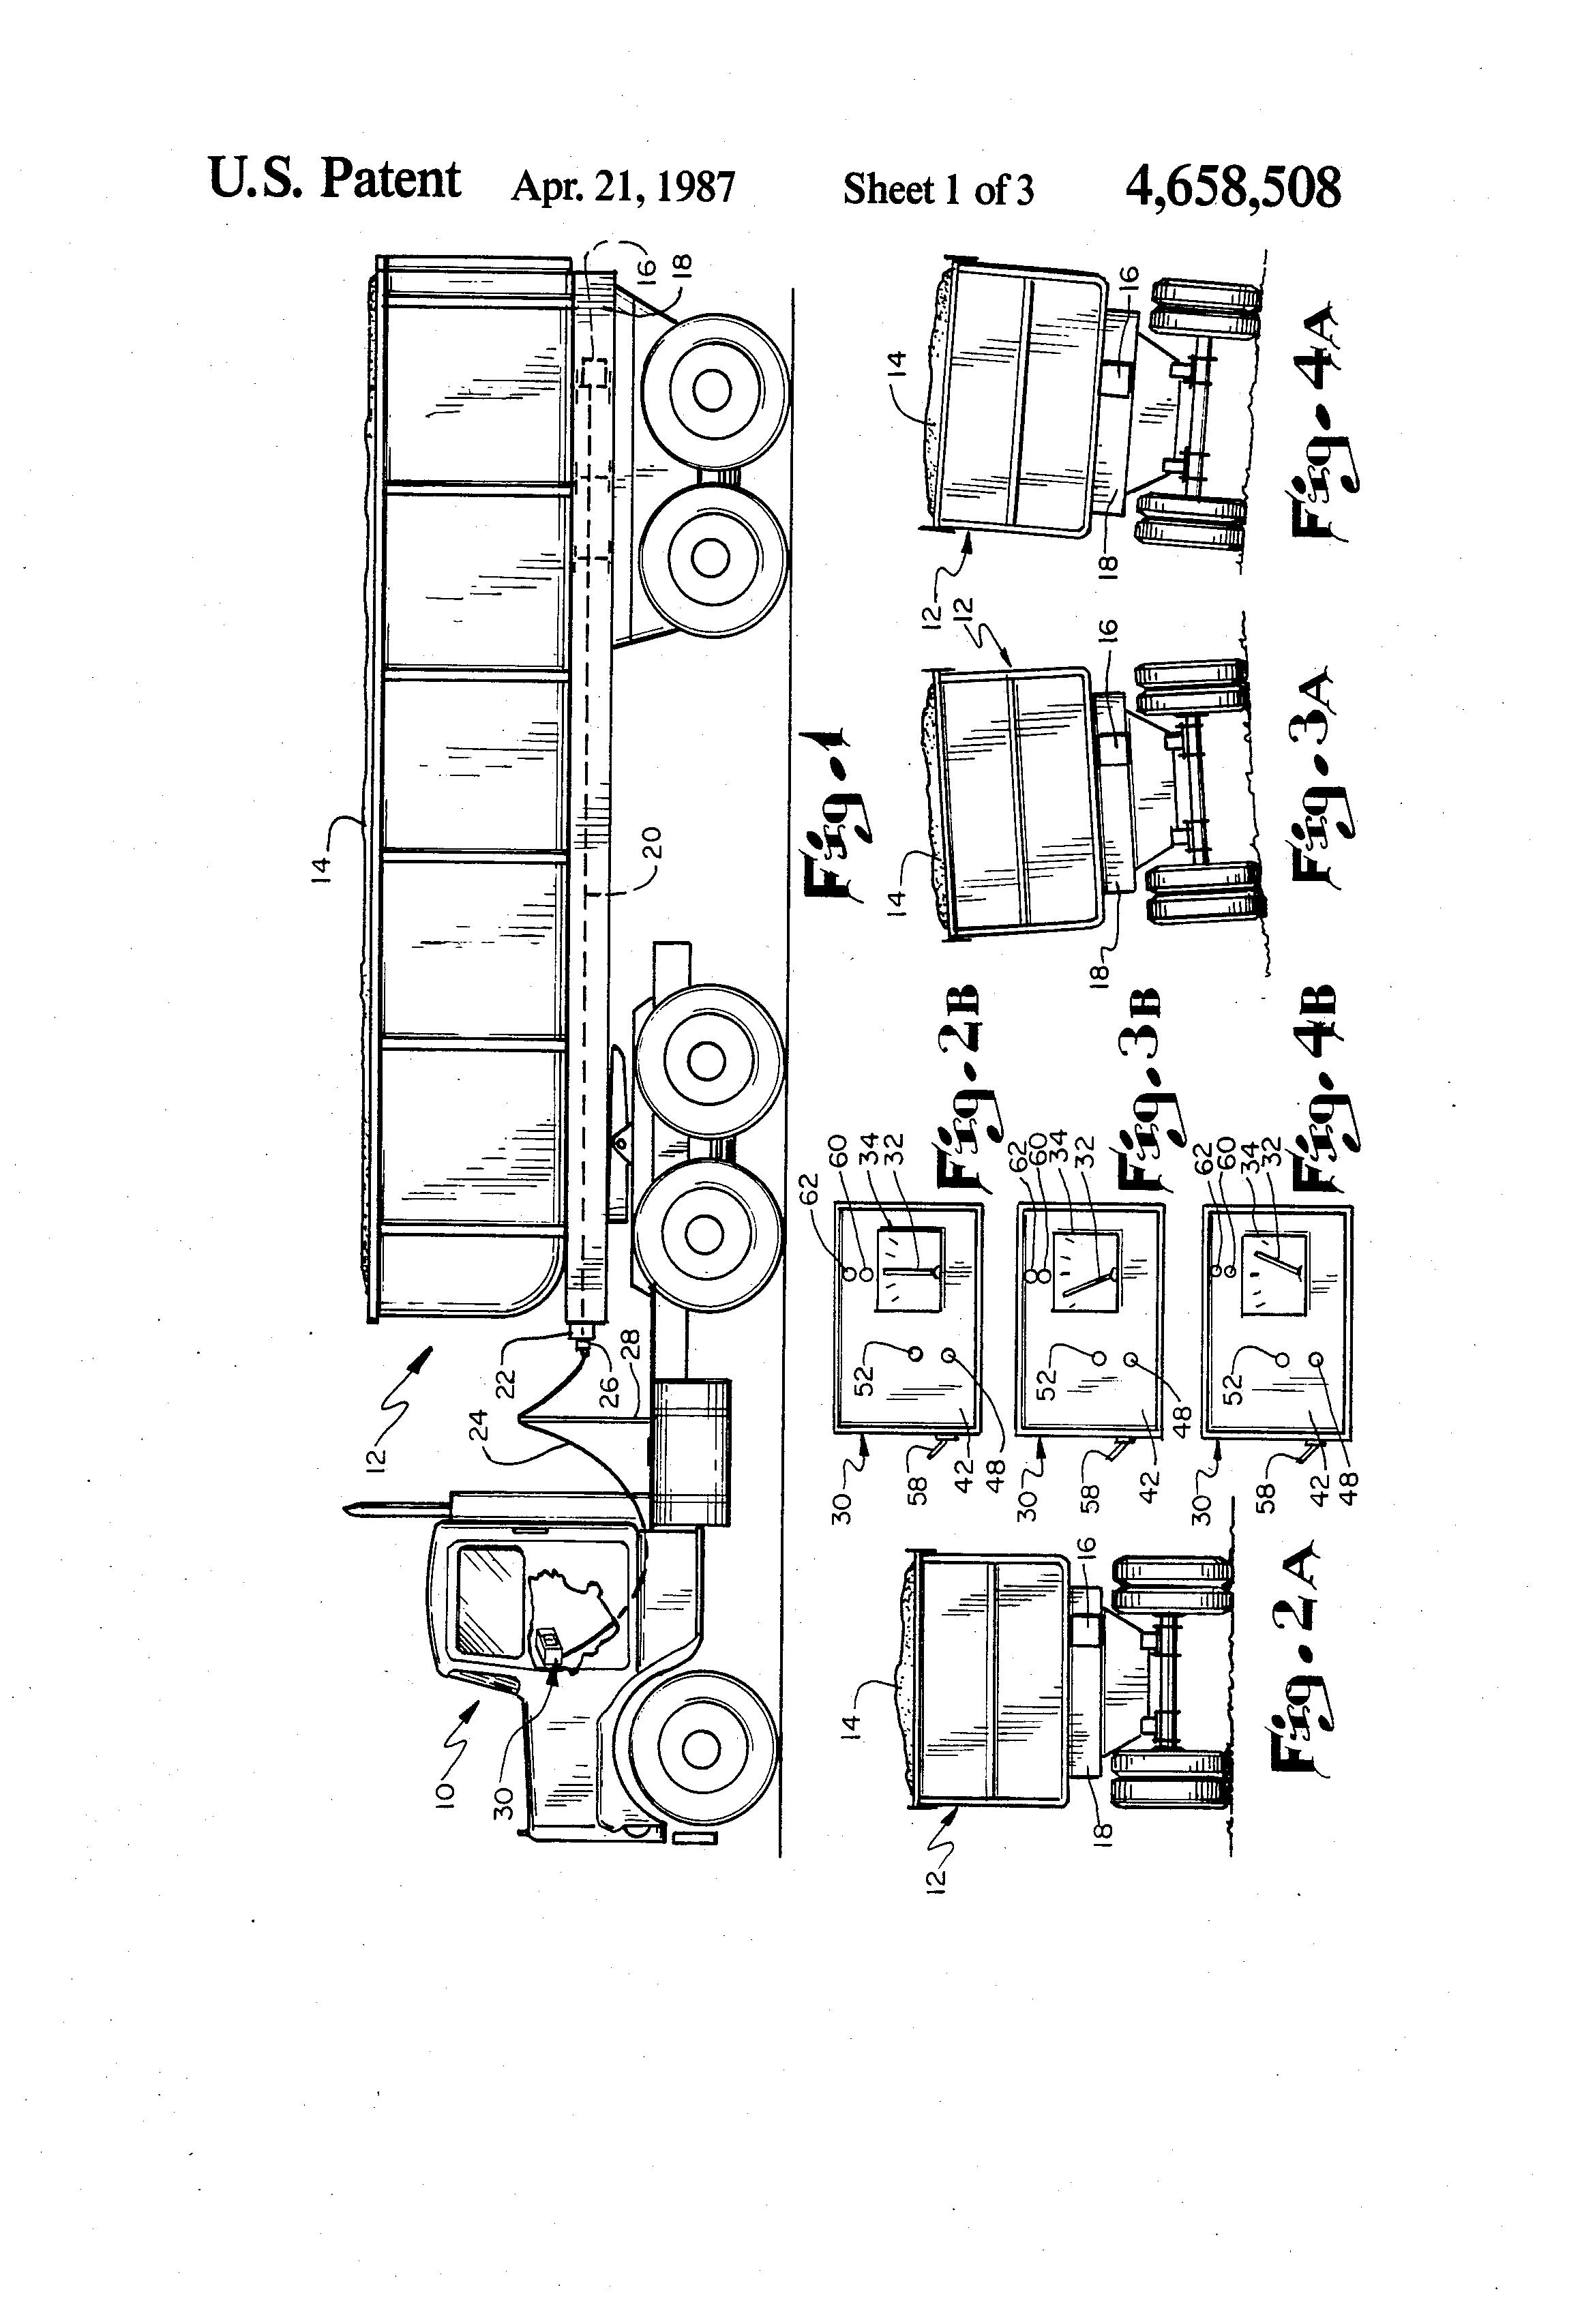 pico trailer hitch wiring diagram